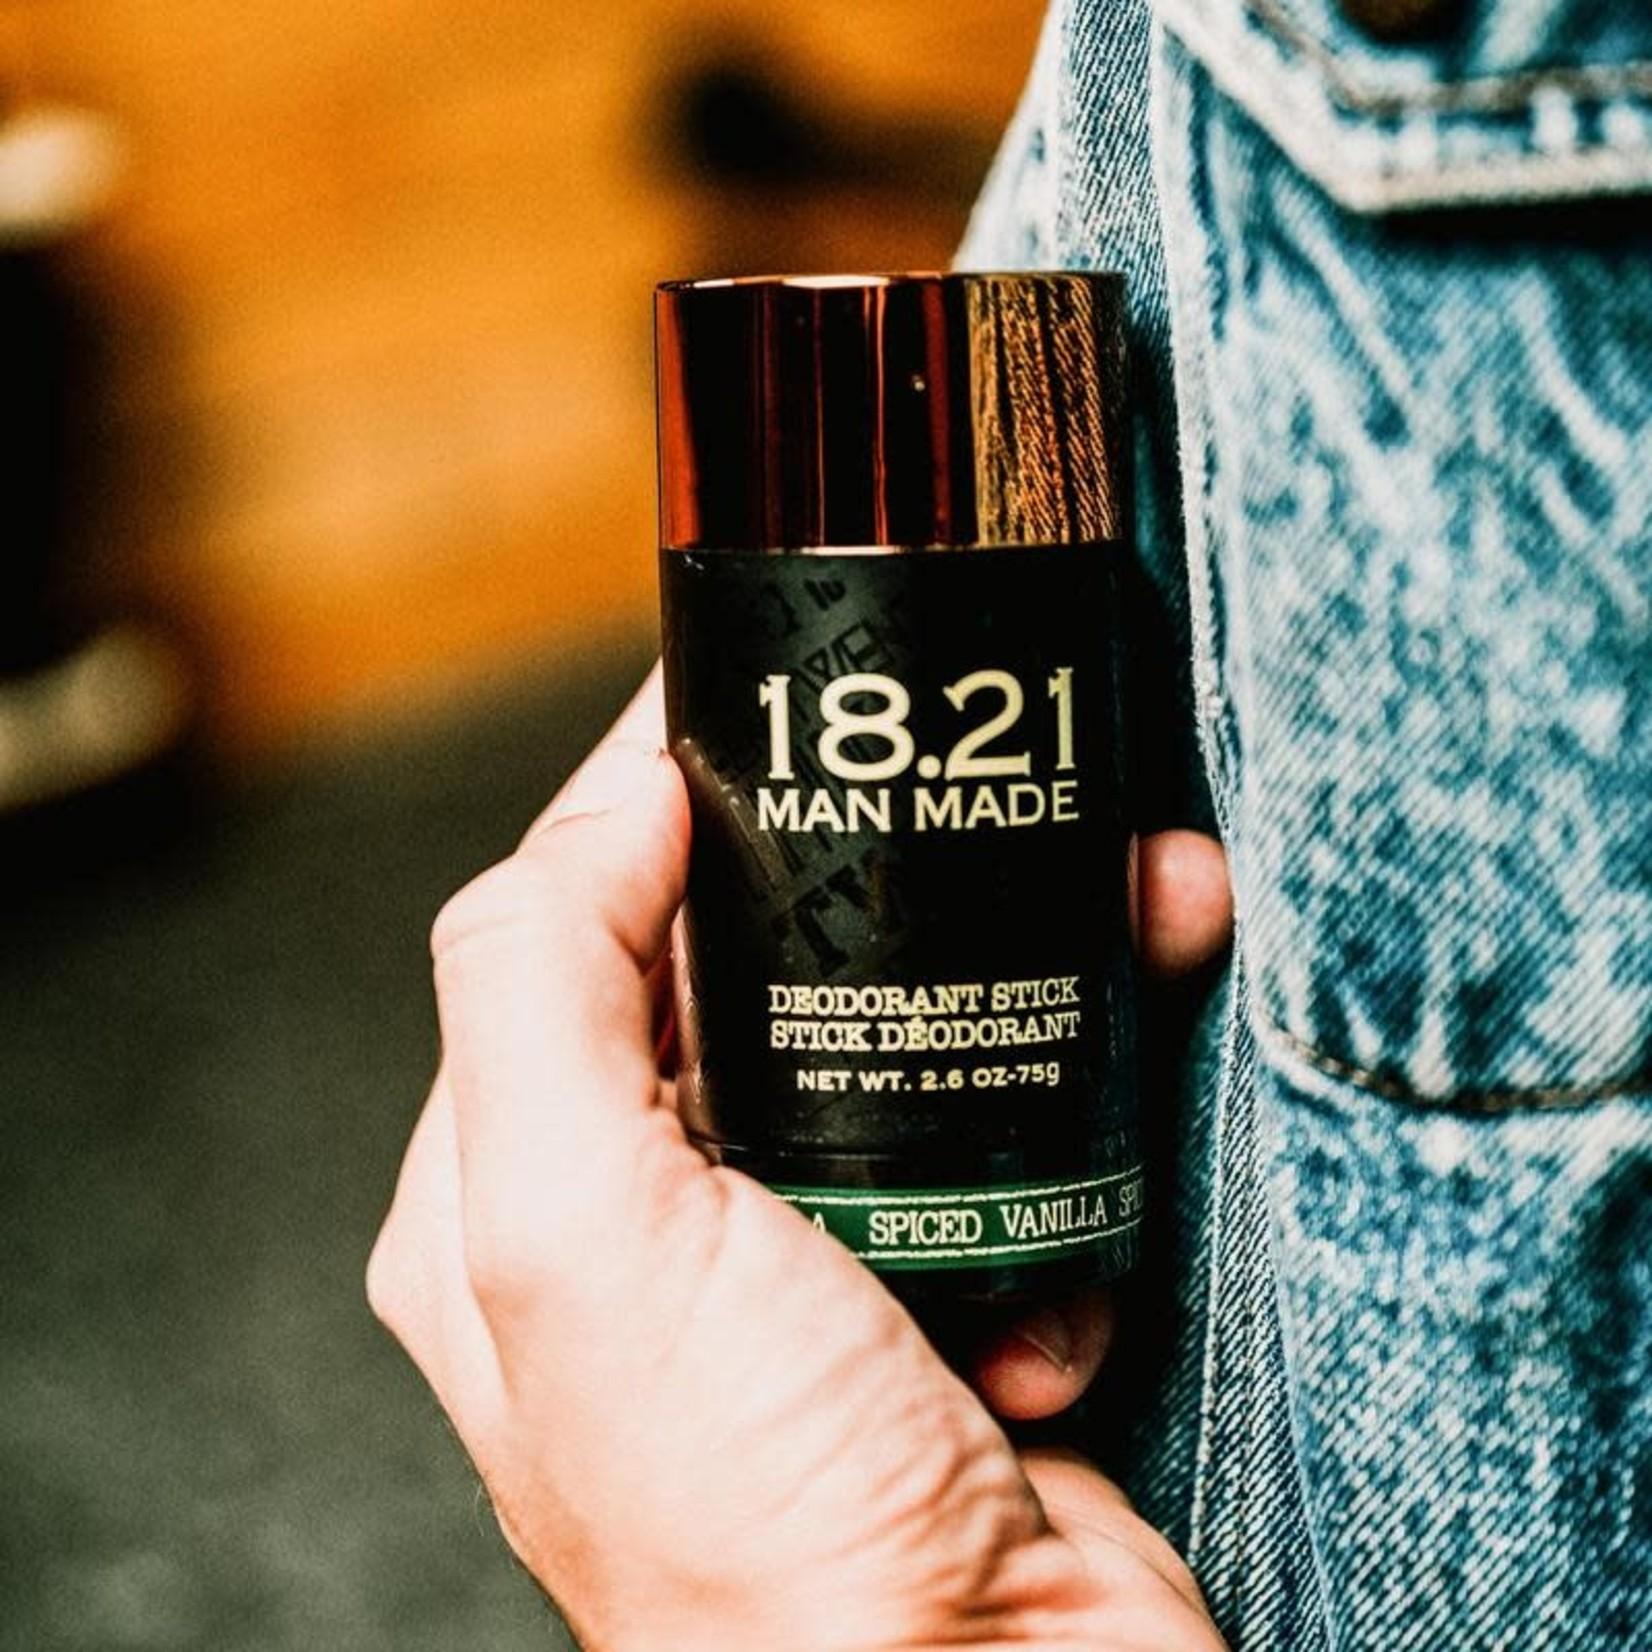 18.21 Man Made 18.21 Man Made Deodorant 2.6 oz Spiced Vanilla